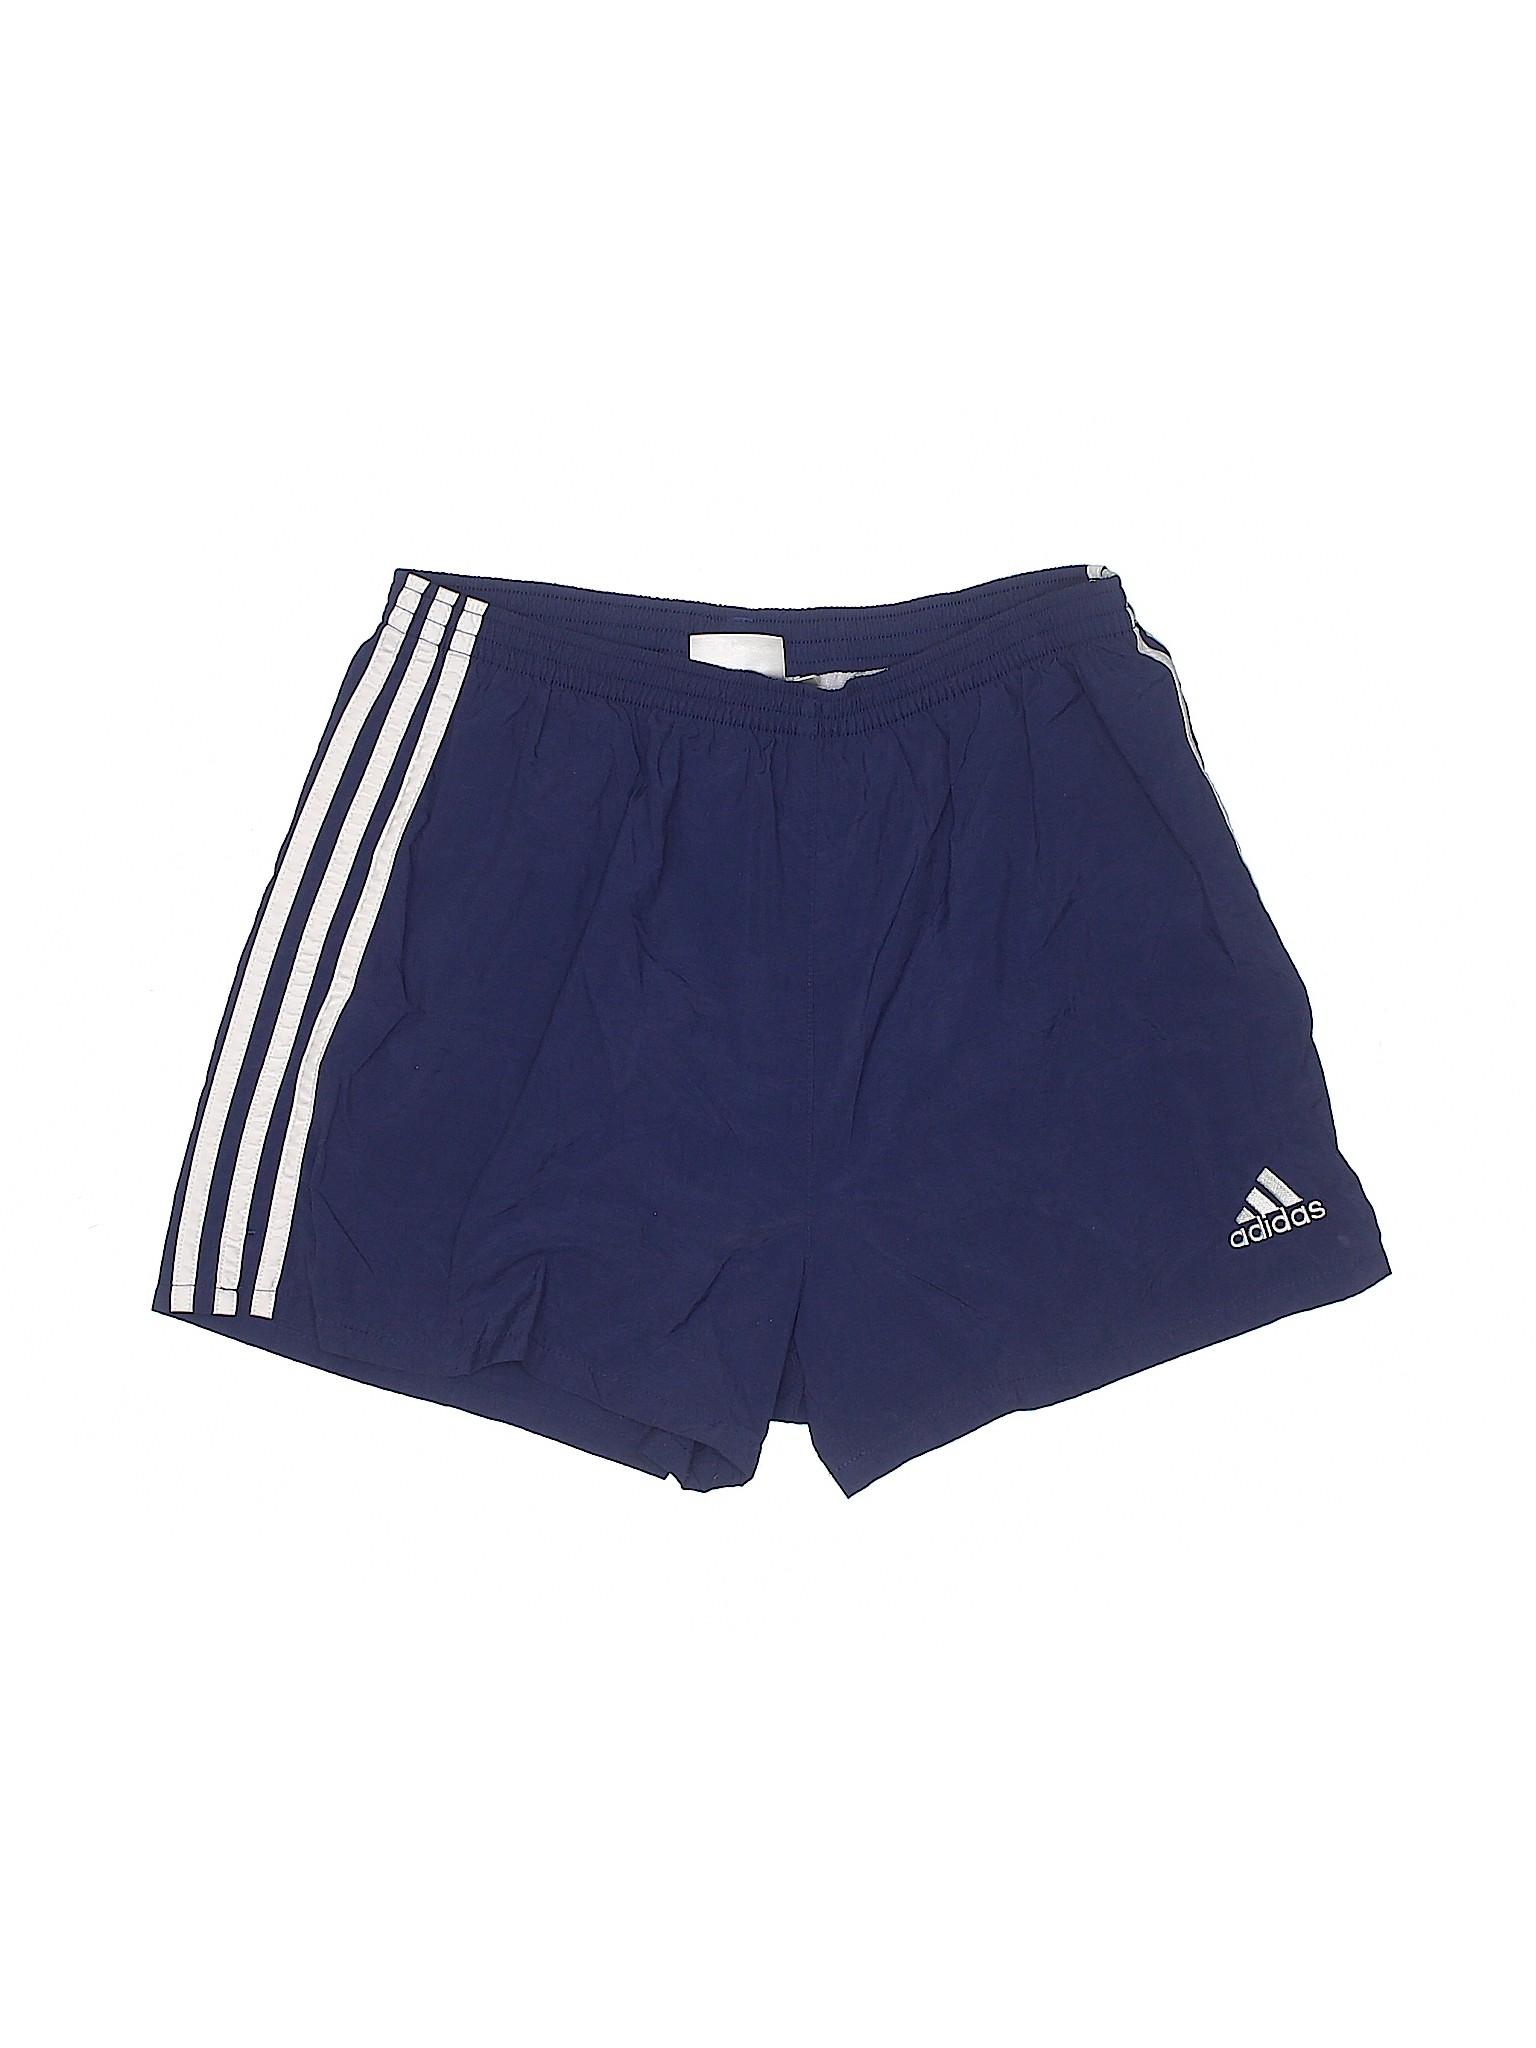 Athletic Adidas Leisure Leisure Adidas Athletic Shorts Leisure Boutique Boutique Boutique Shorts wOFqzxCU